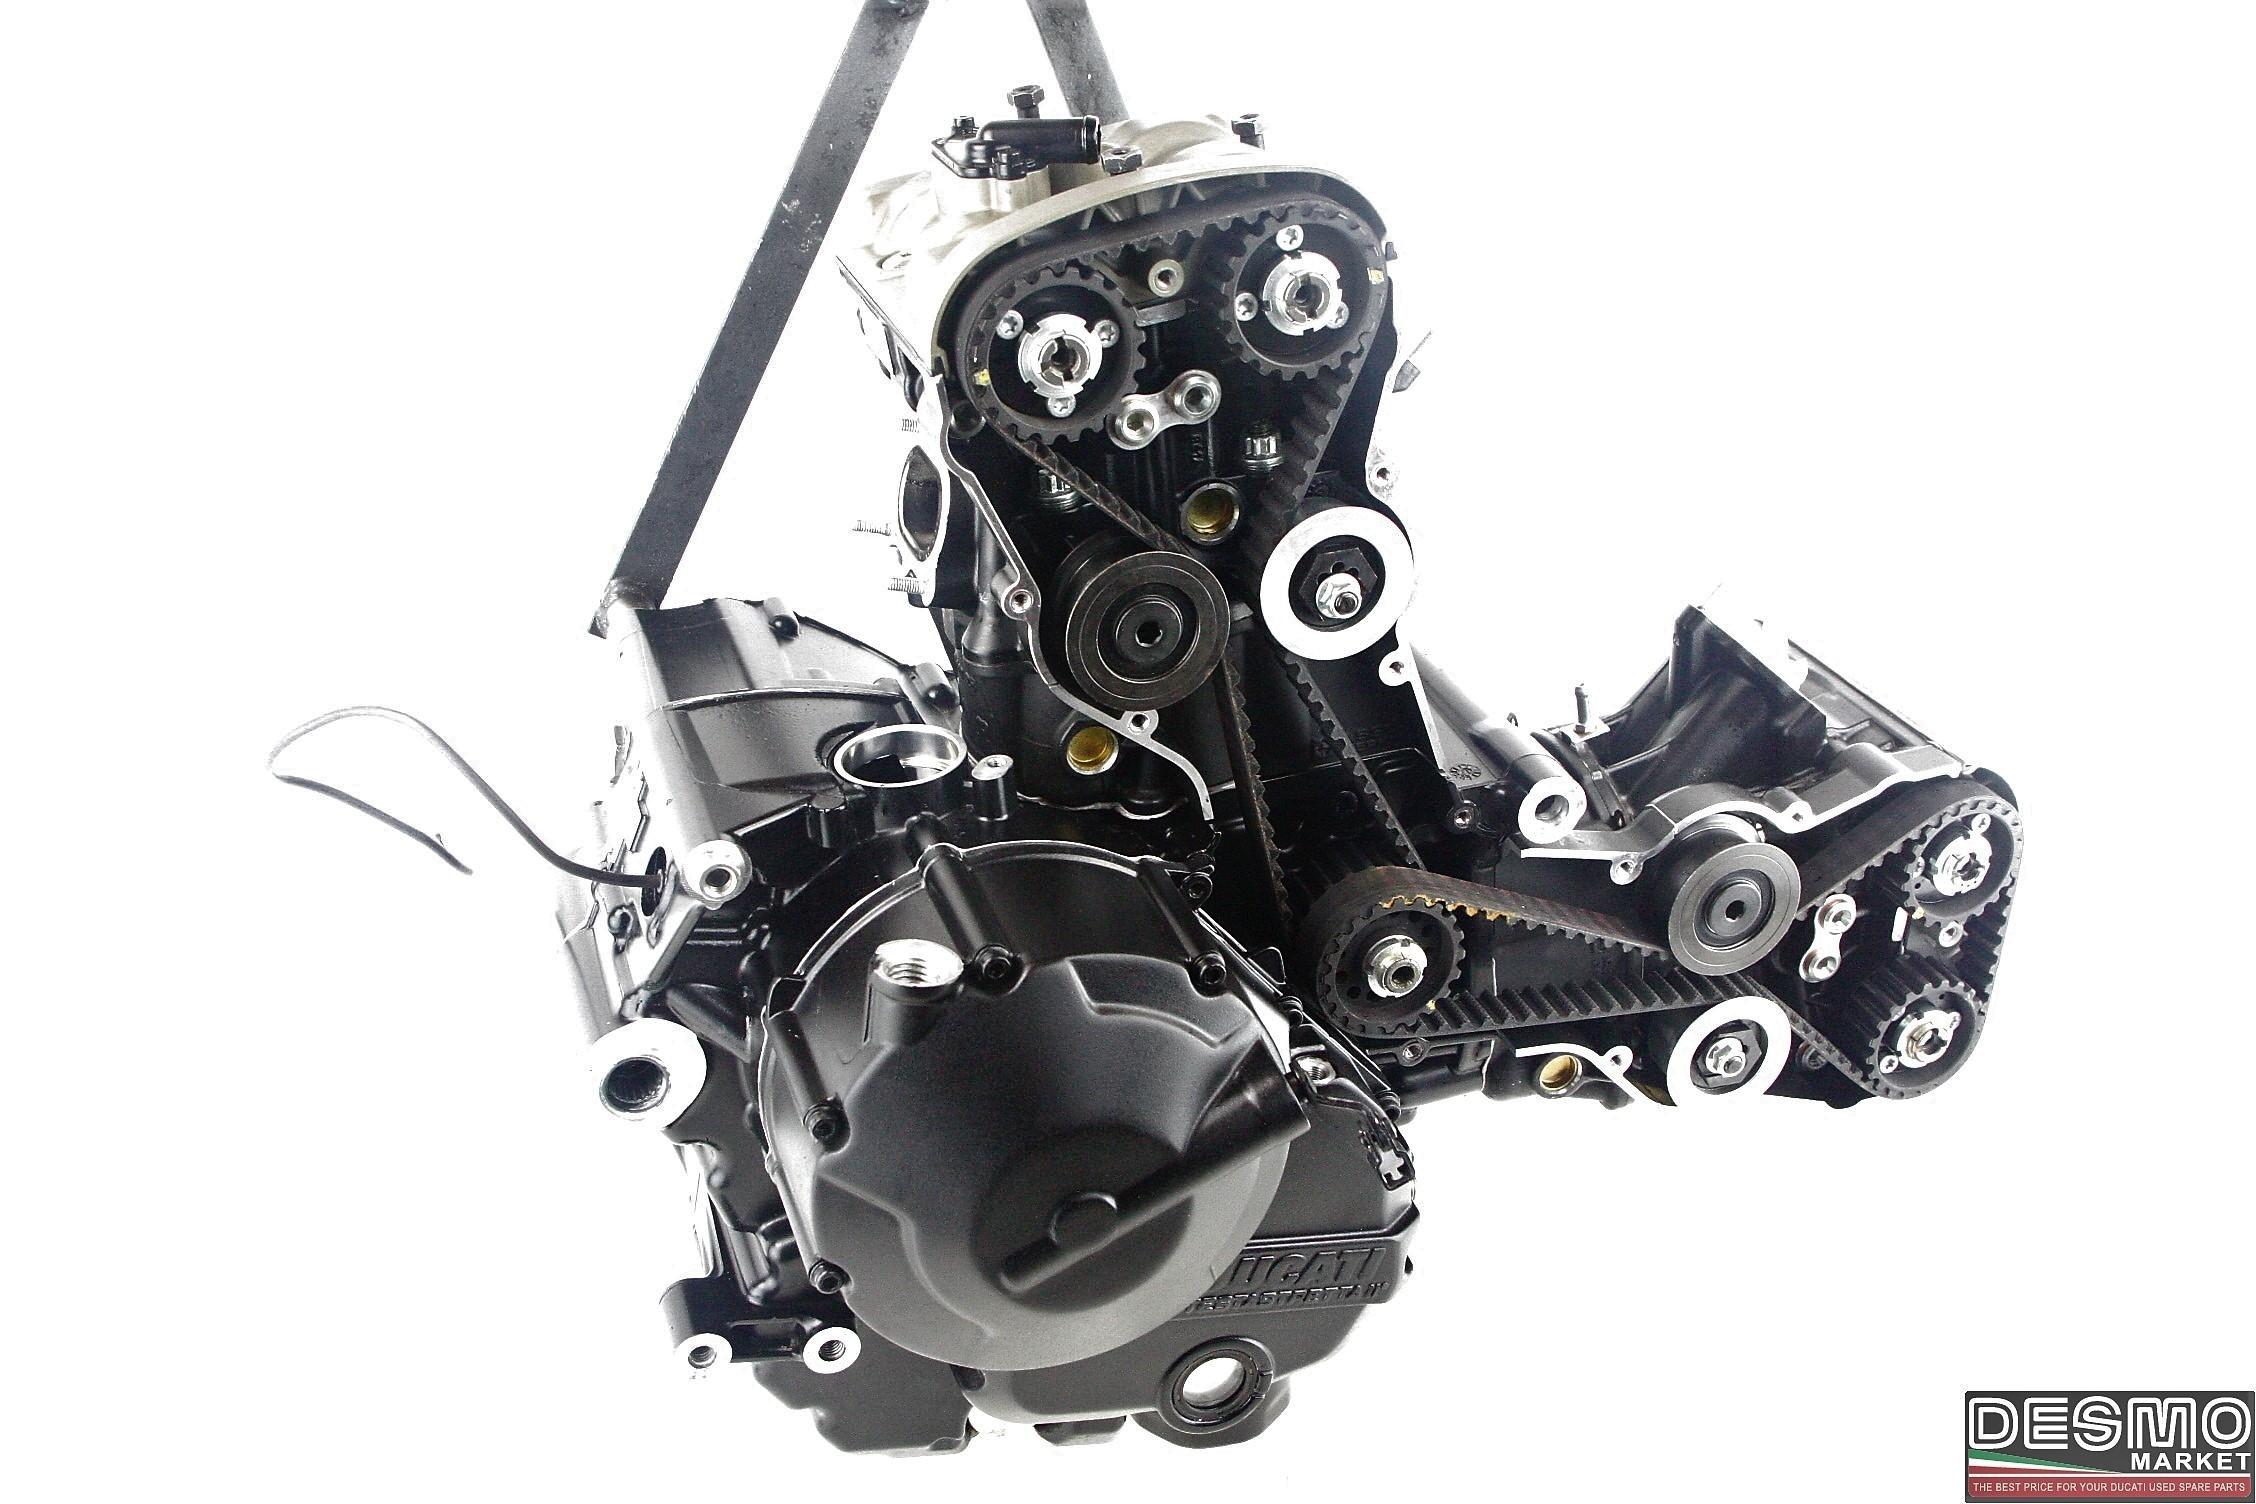 Motore ducati 939 hypermotard multistrada 950